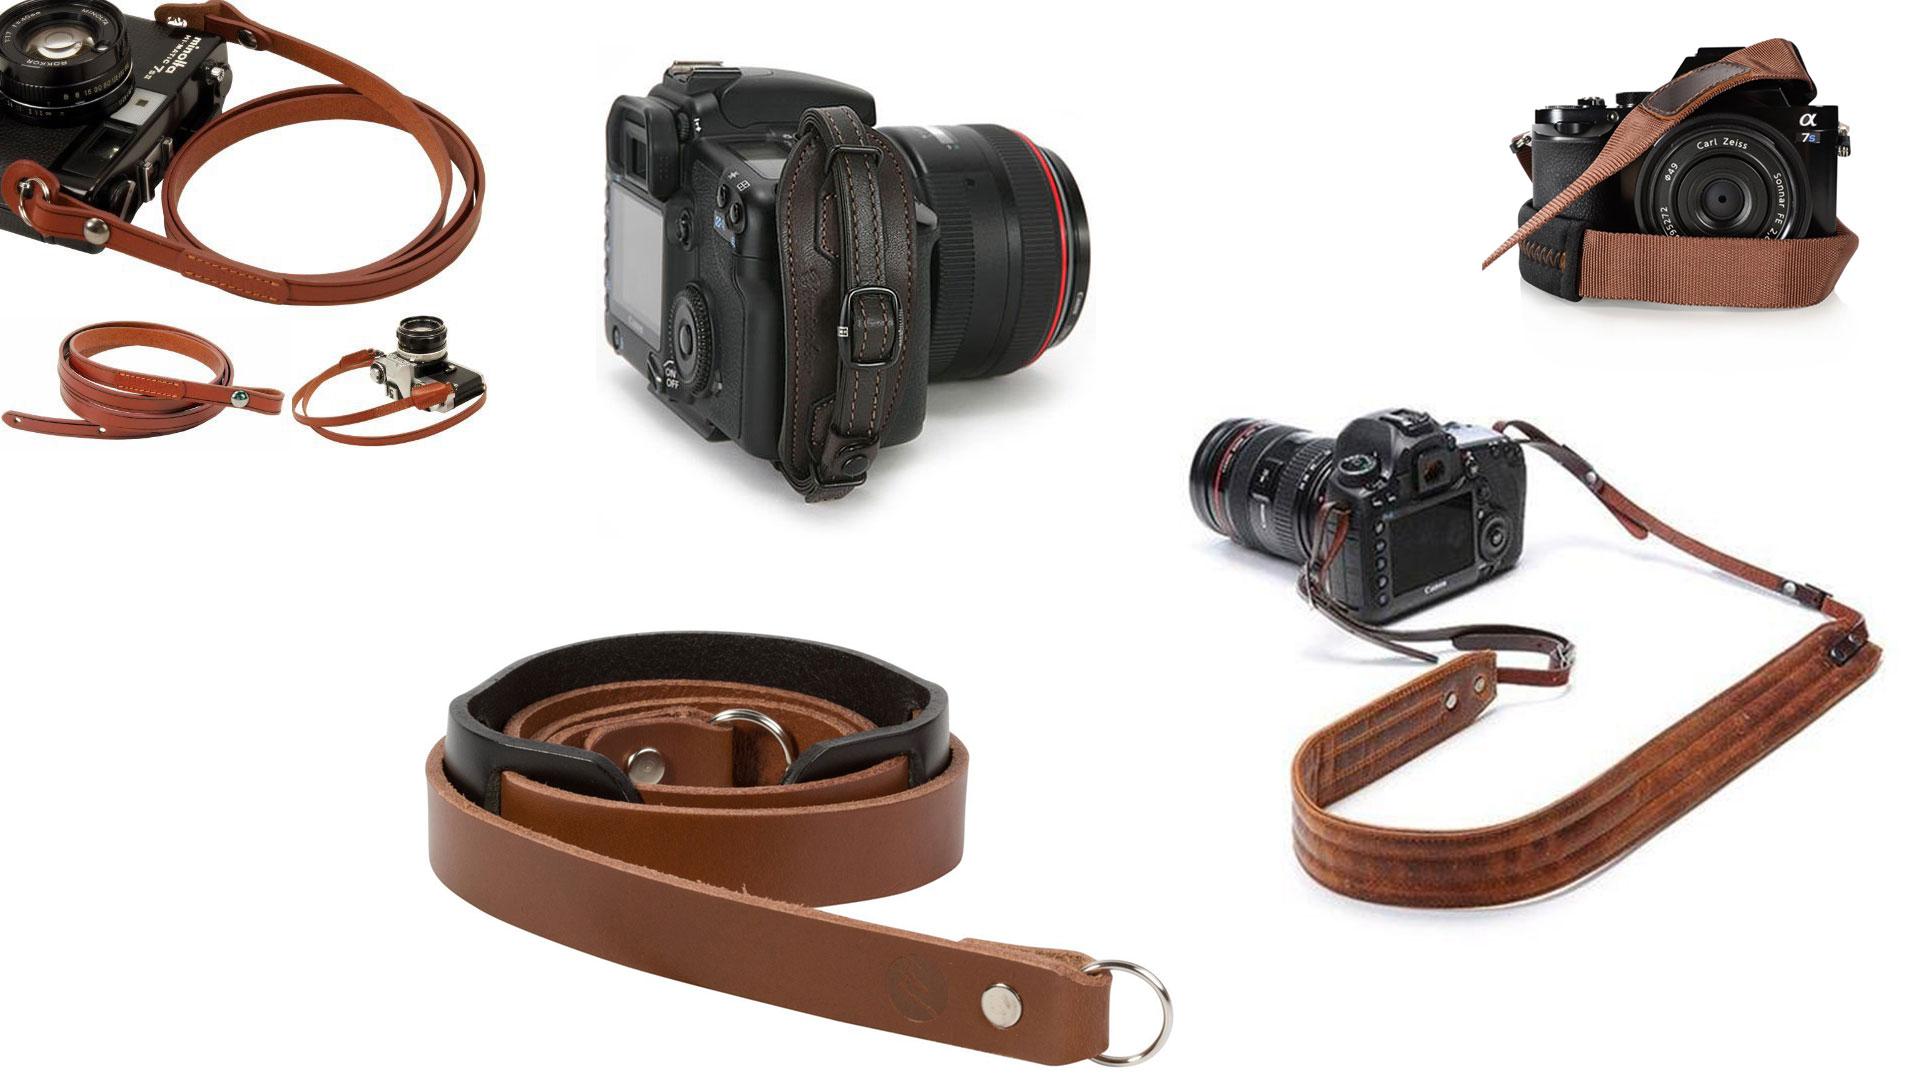 Camera strap for women,Leather camera strap,Personalized camera strap,Dslr camera strap,Nikon camera strap,Adjustable camera strap